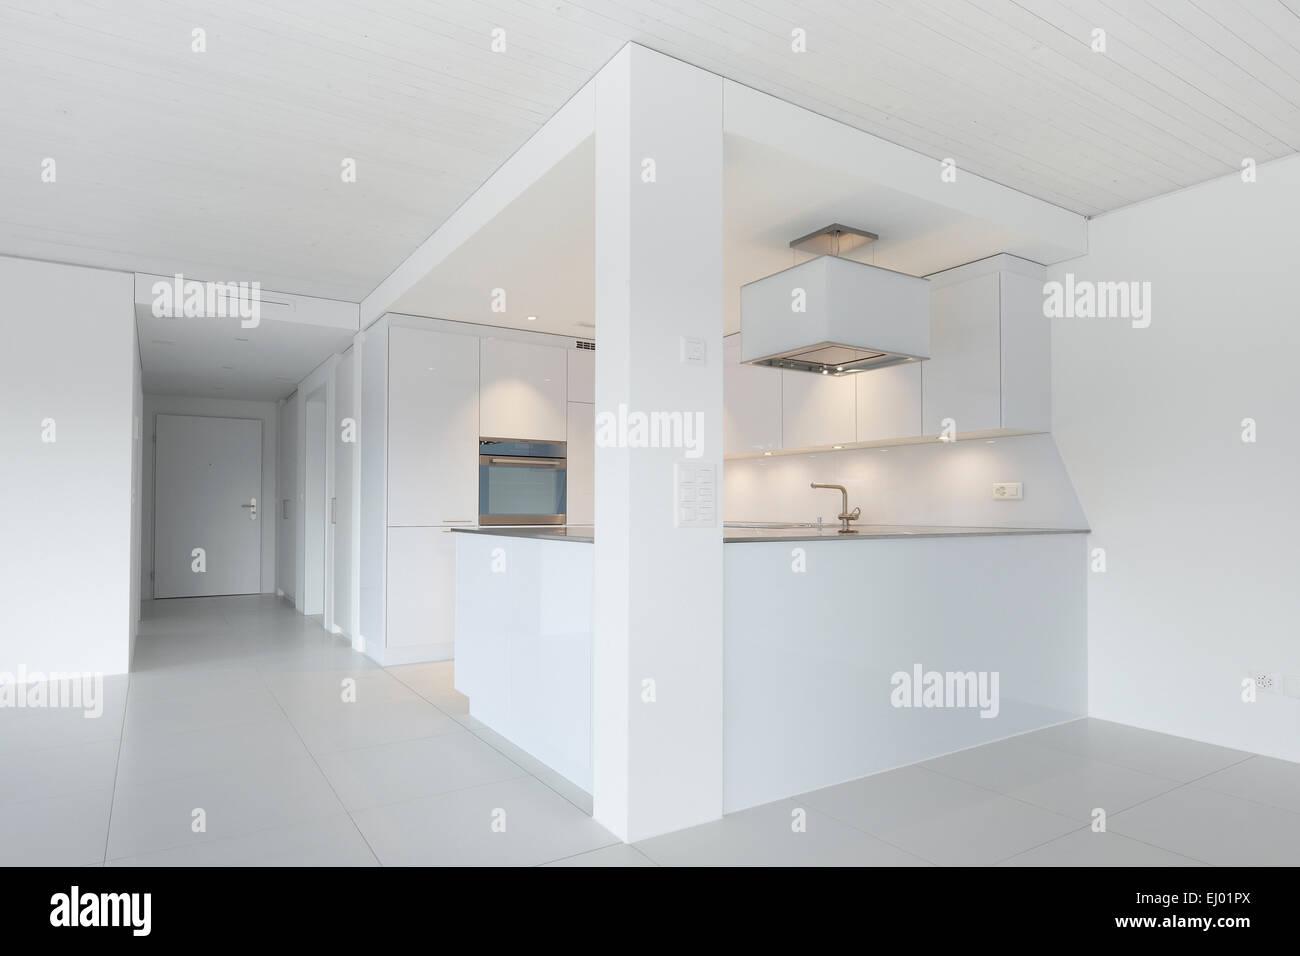 Architecture, chrome steel, house, home, interior, kitchen, Switzerland, apartment, white, modern, - Stock Image